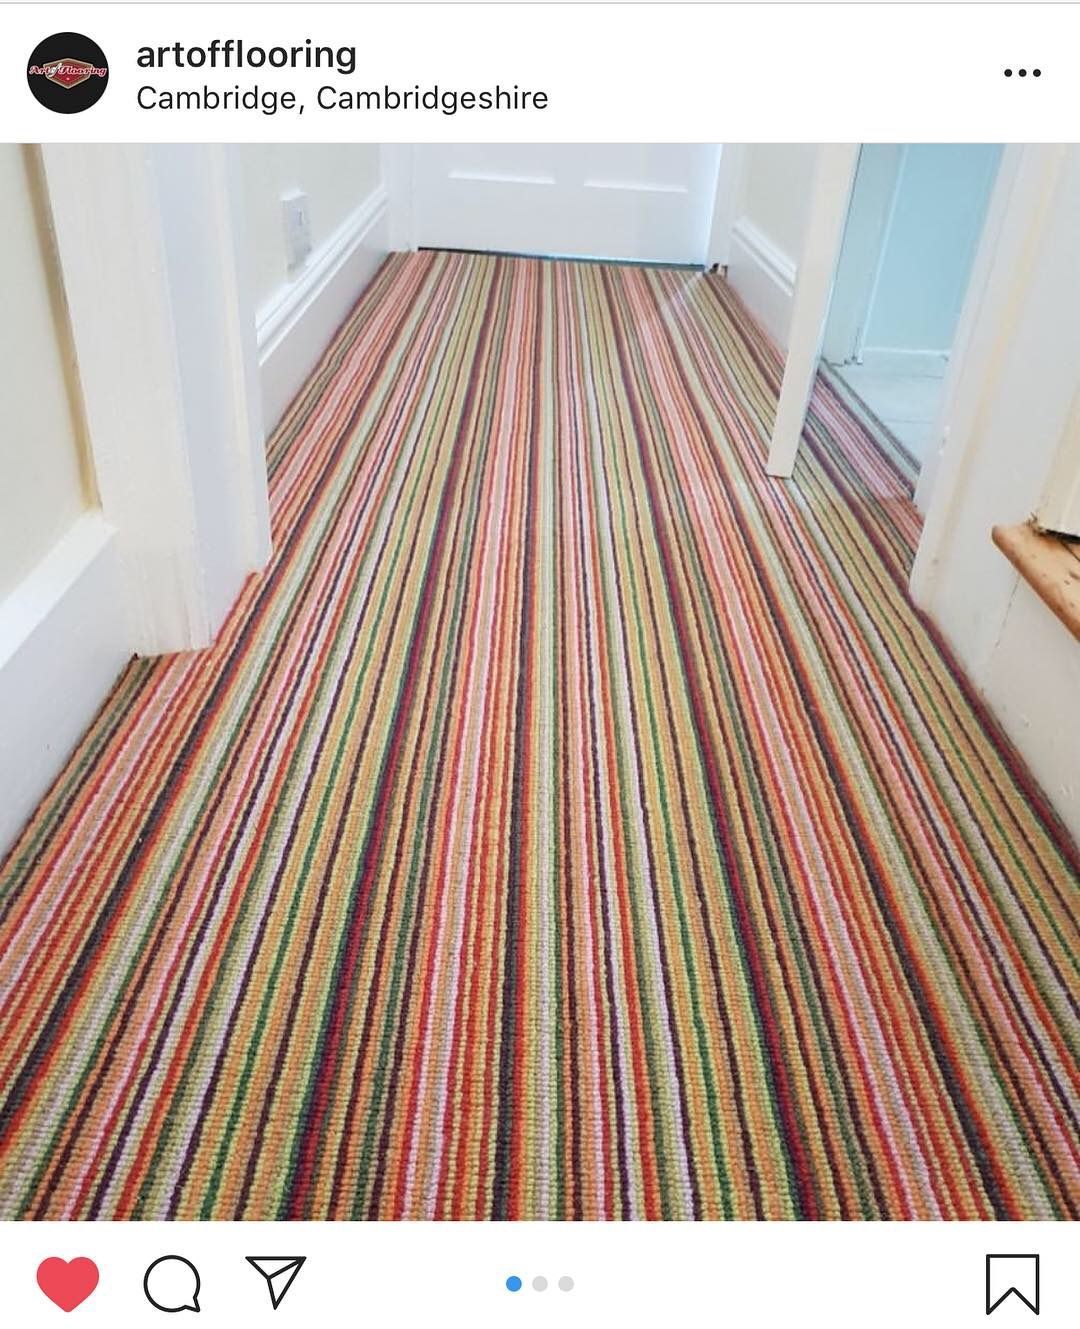 Carpet Installation Carpet And Flooring New Flooring Quality